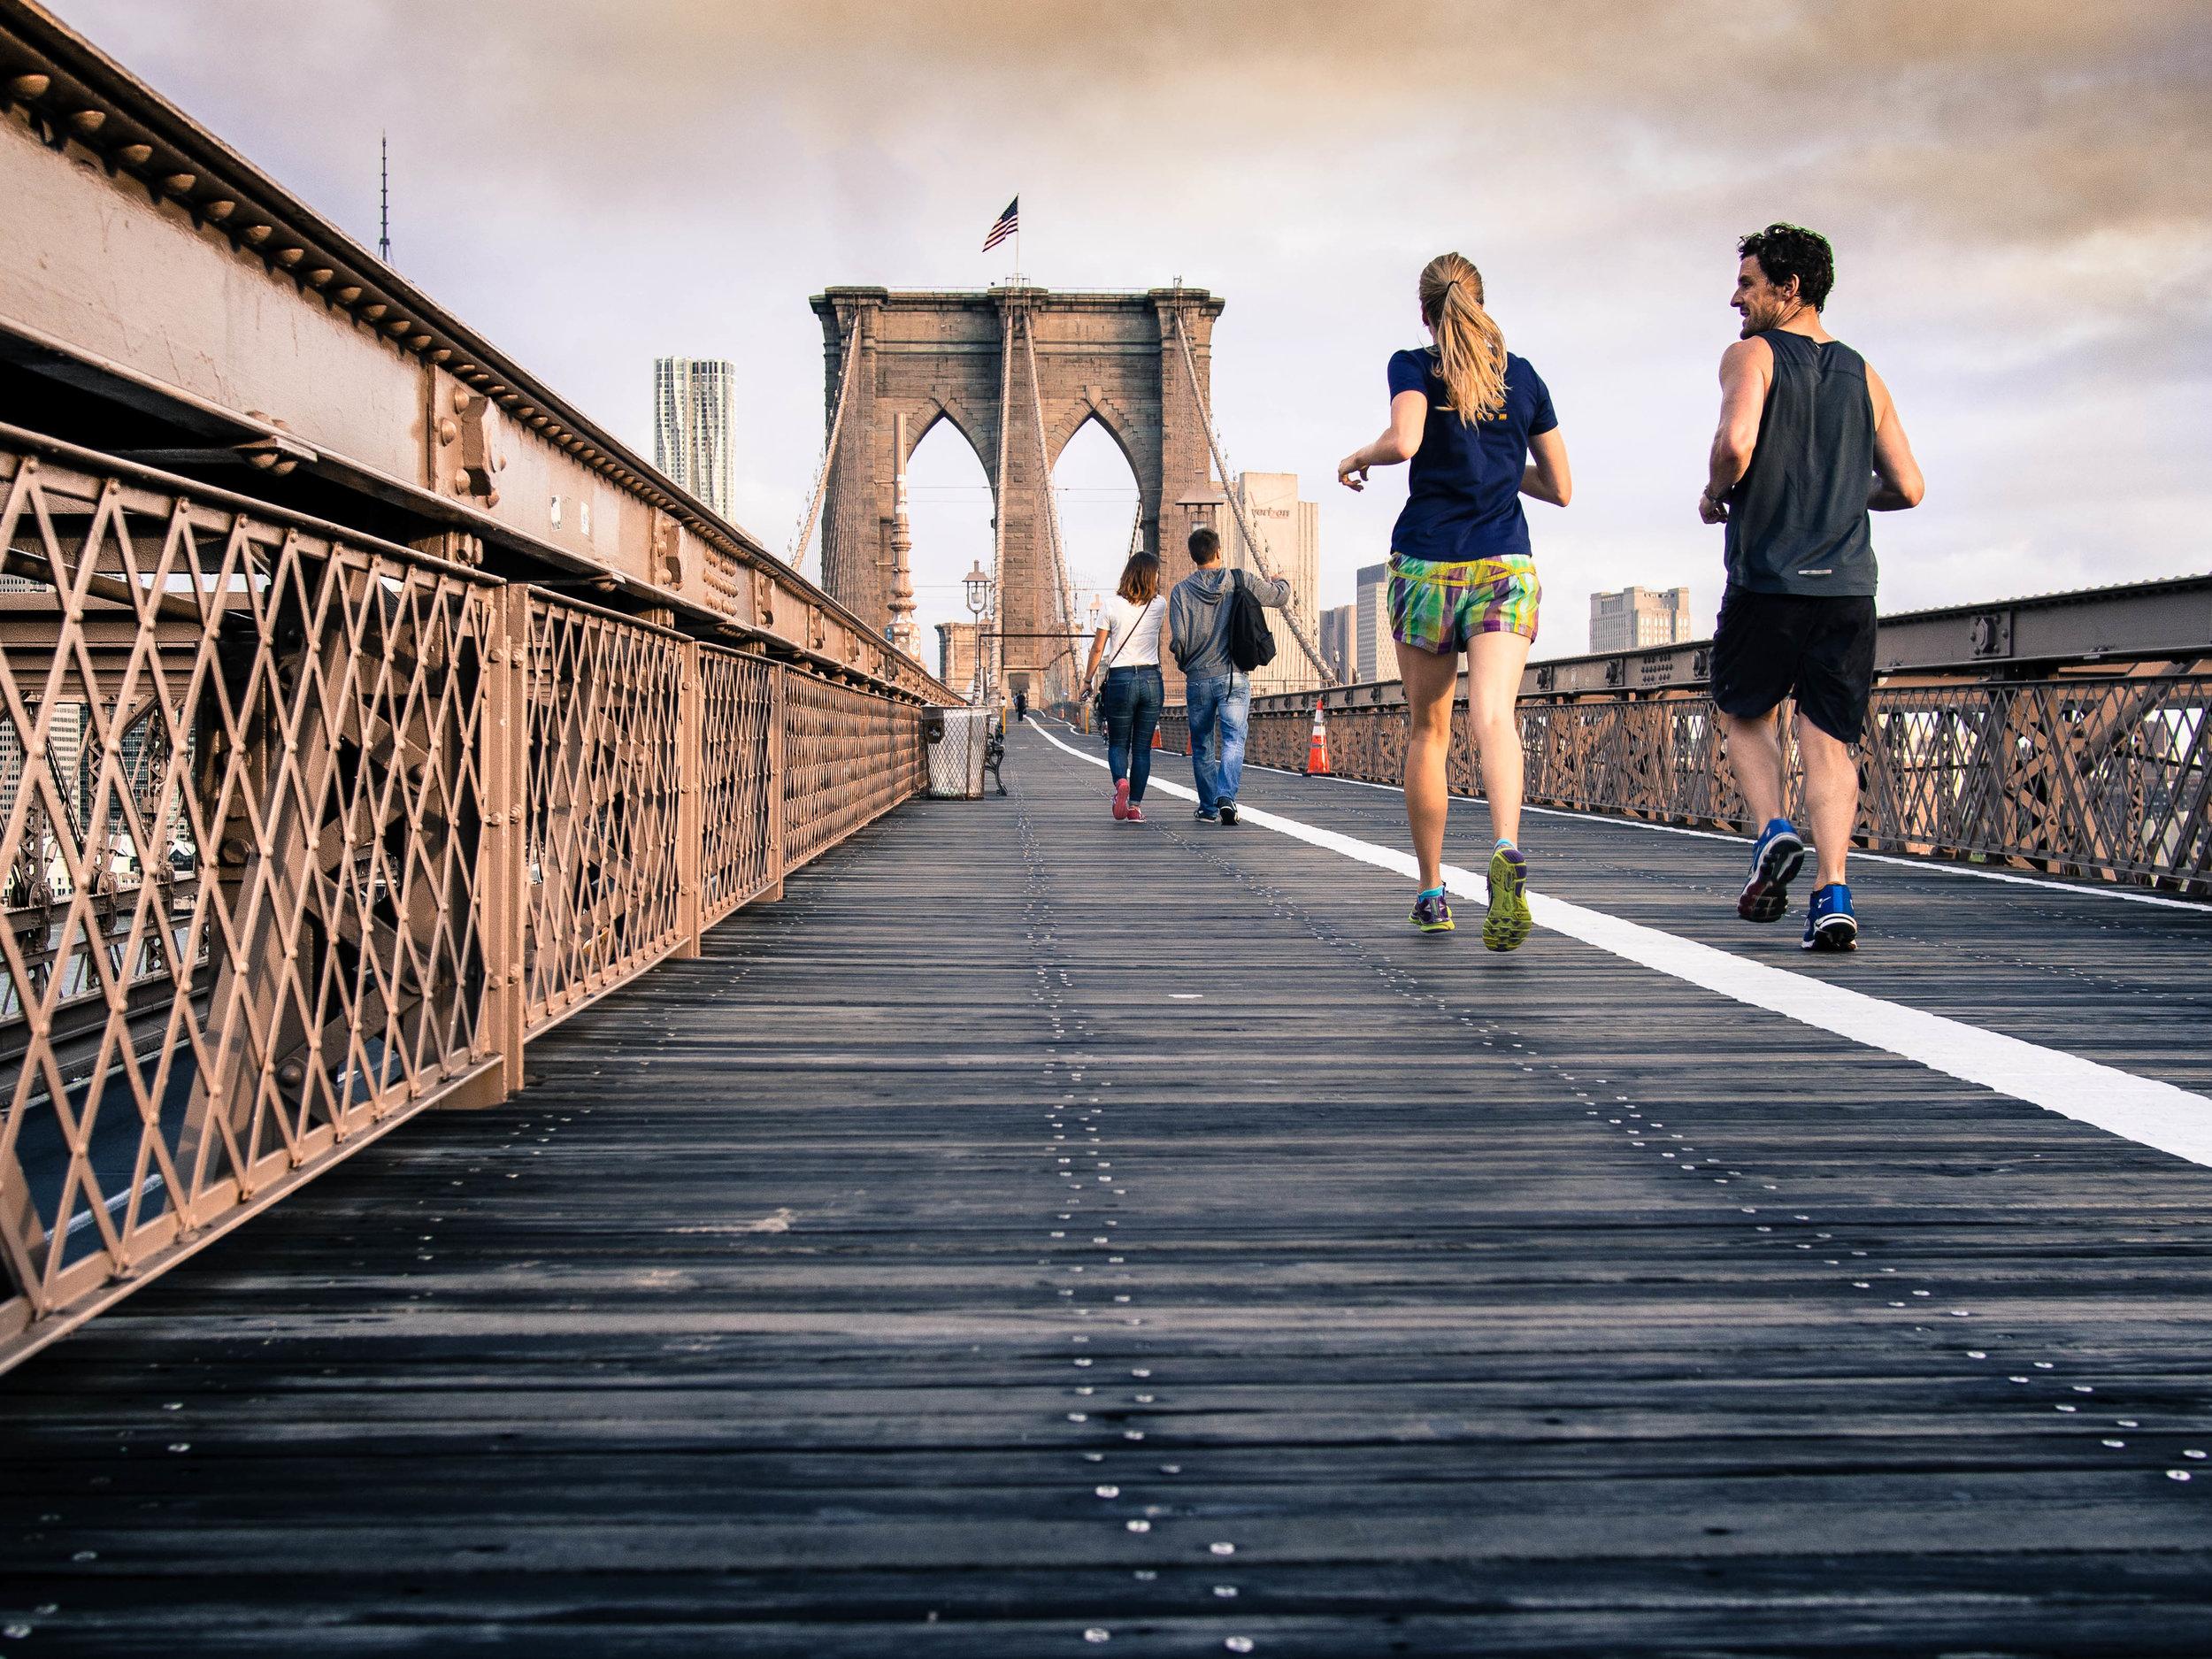 How do we define fitness?